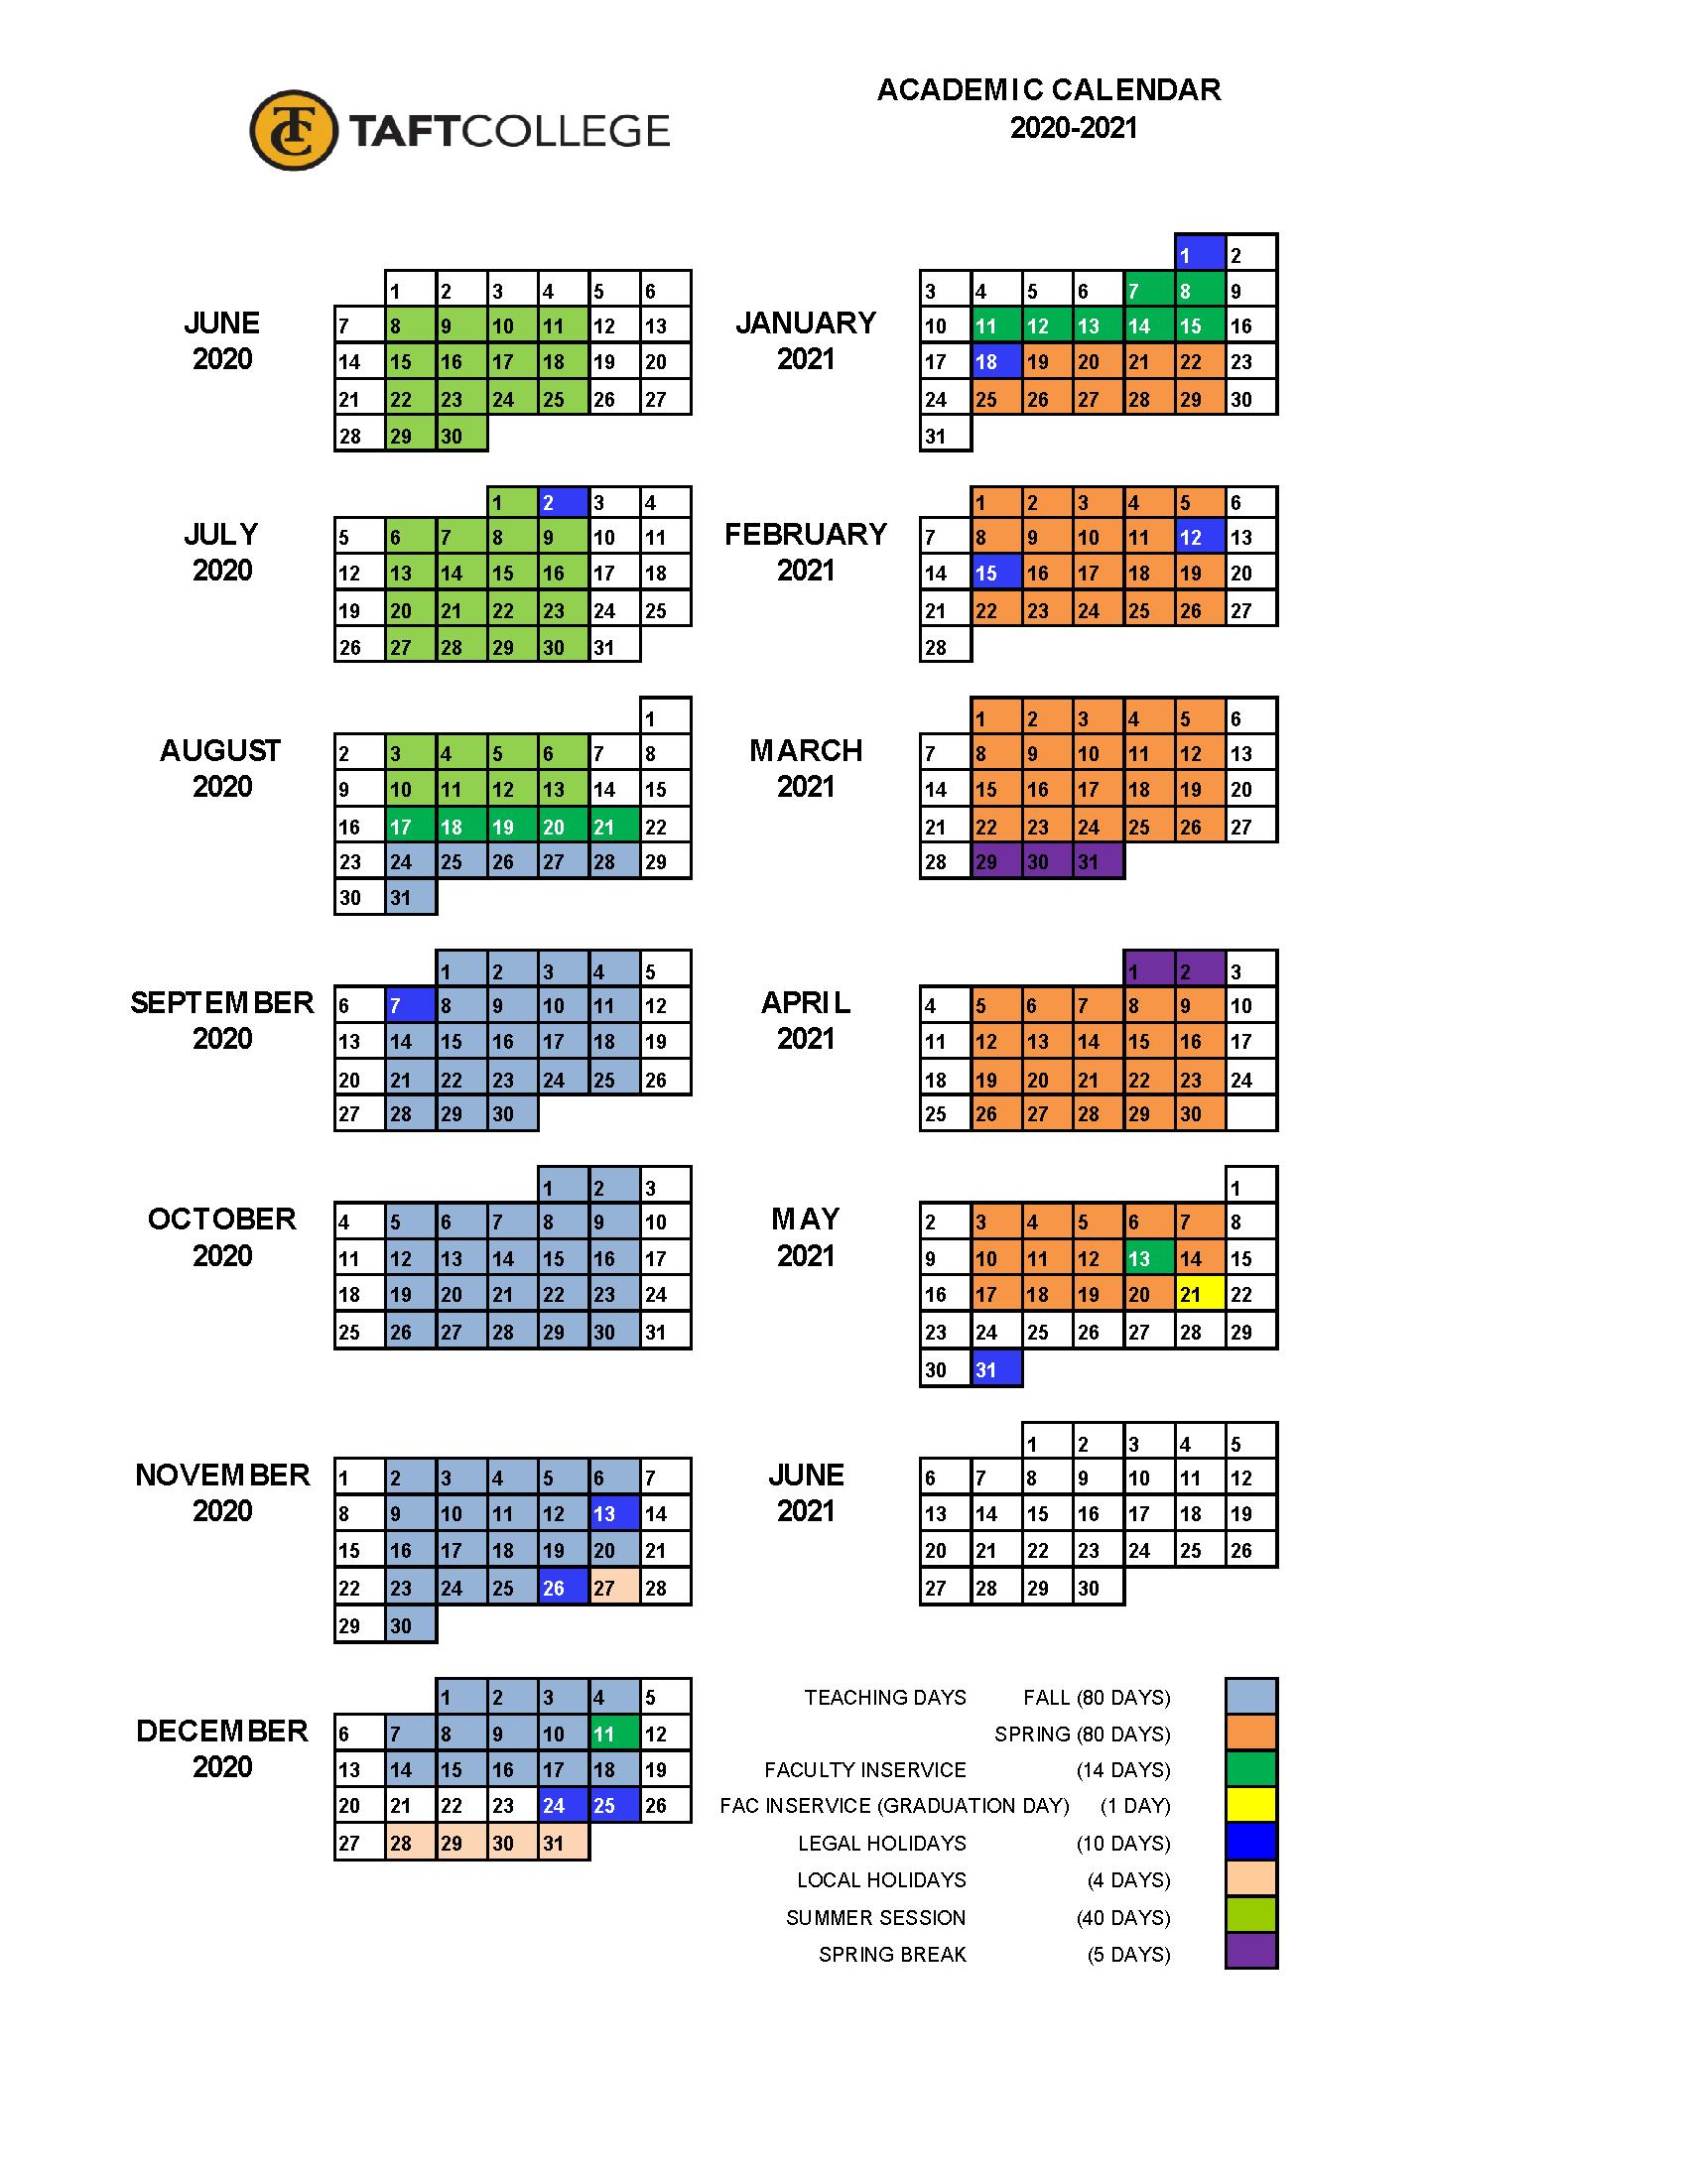 Ucsb Academic Calendar 2022.Human Resources Academic Calendar